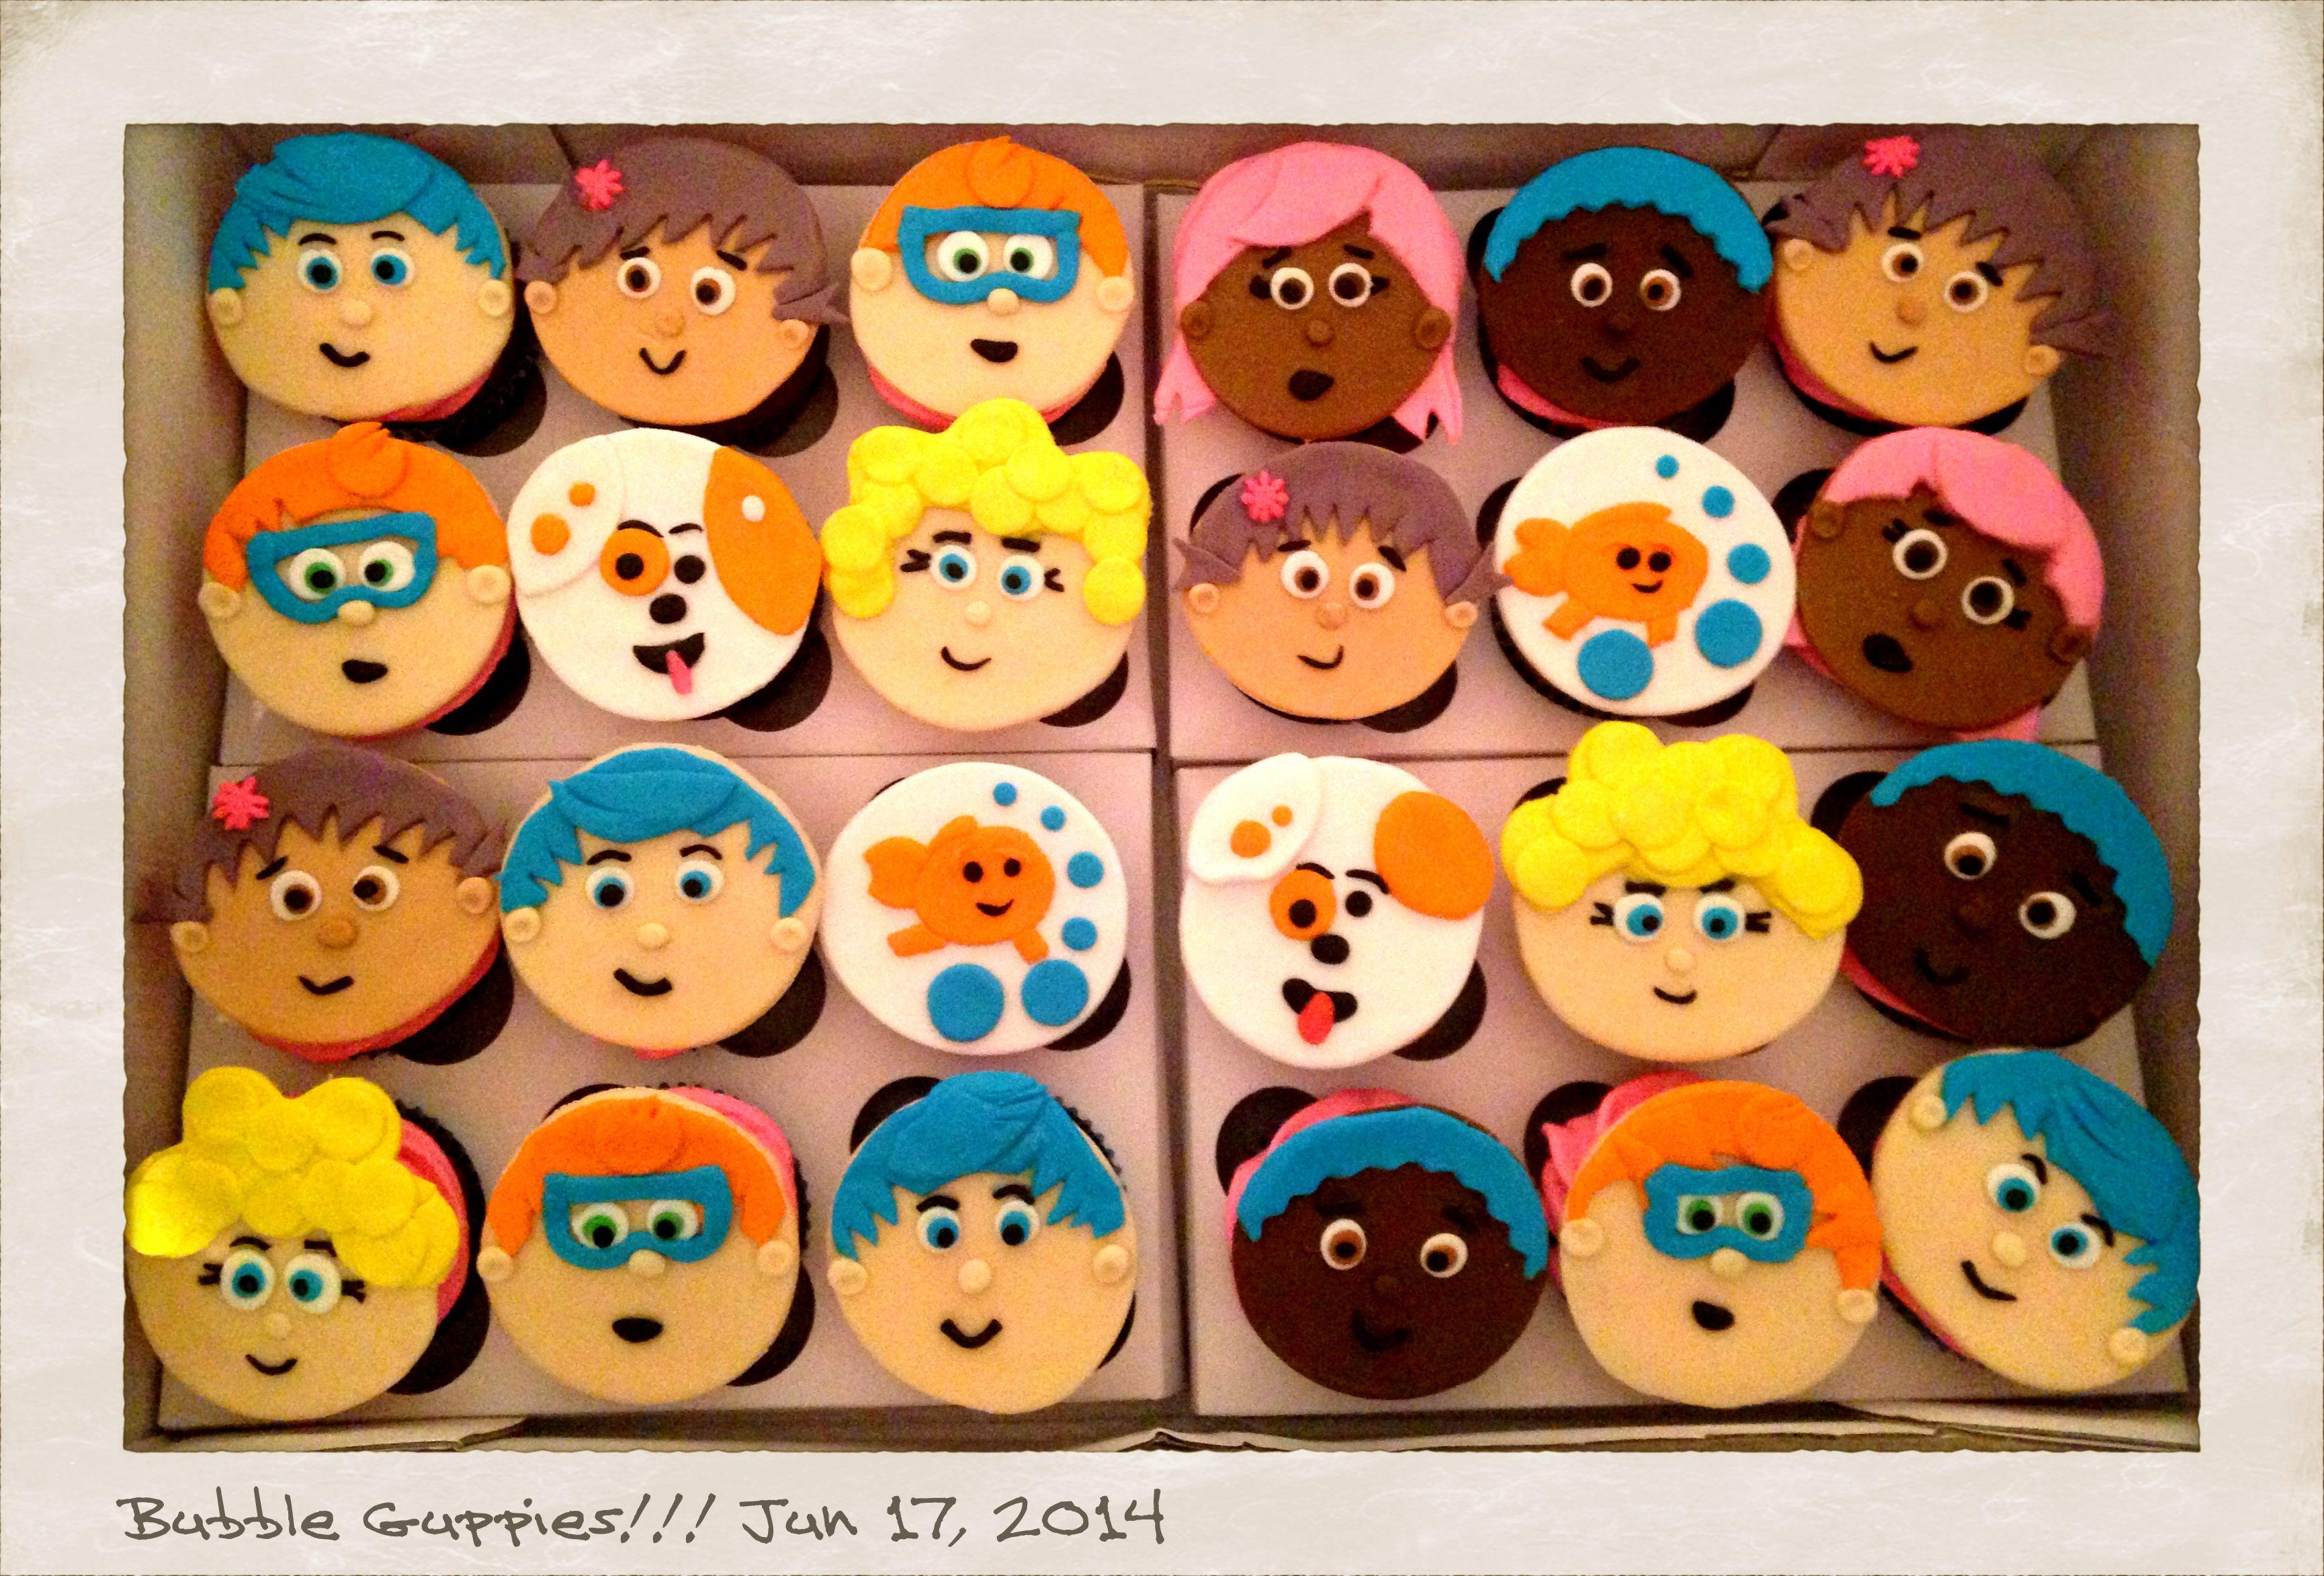 Bubble Guppies Cupcakes!